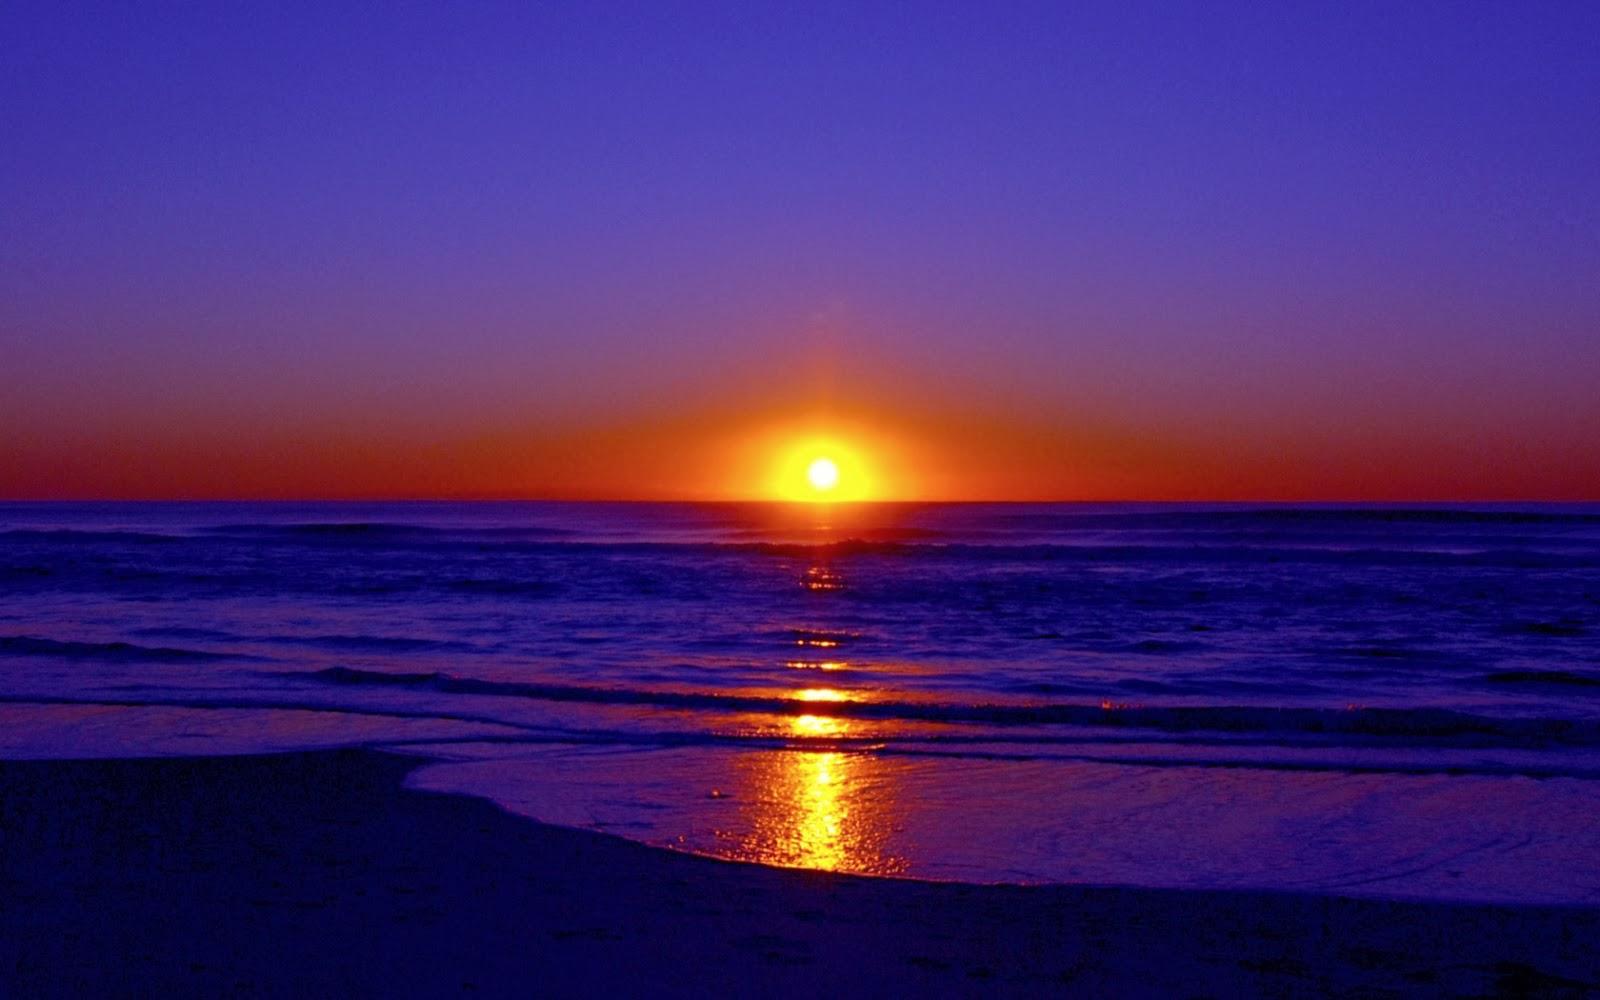 sunset awesome oregon wallpaper - photo #45